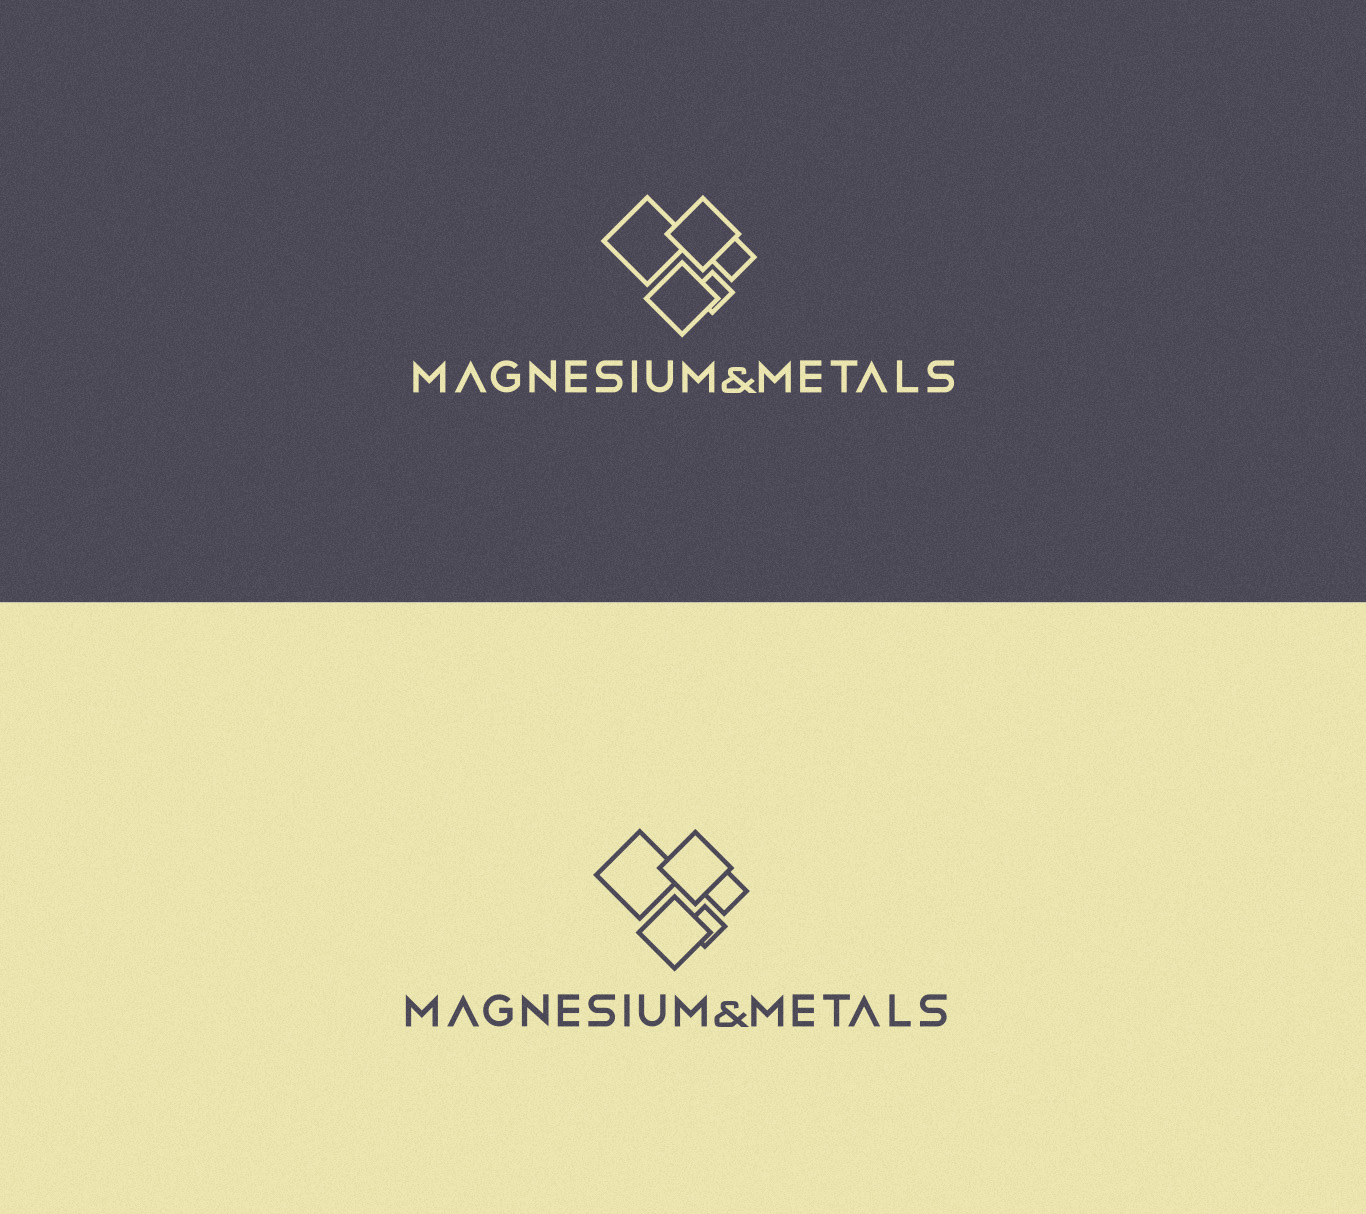 Логотип для проекта Magnesium&Metals фото f_4e7a249b0cd21.jpg